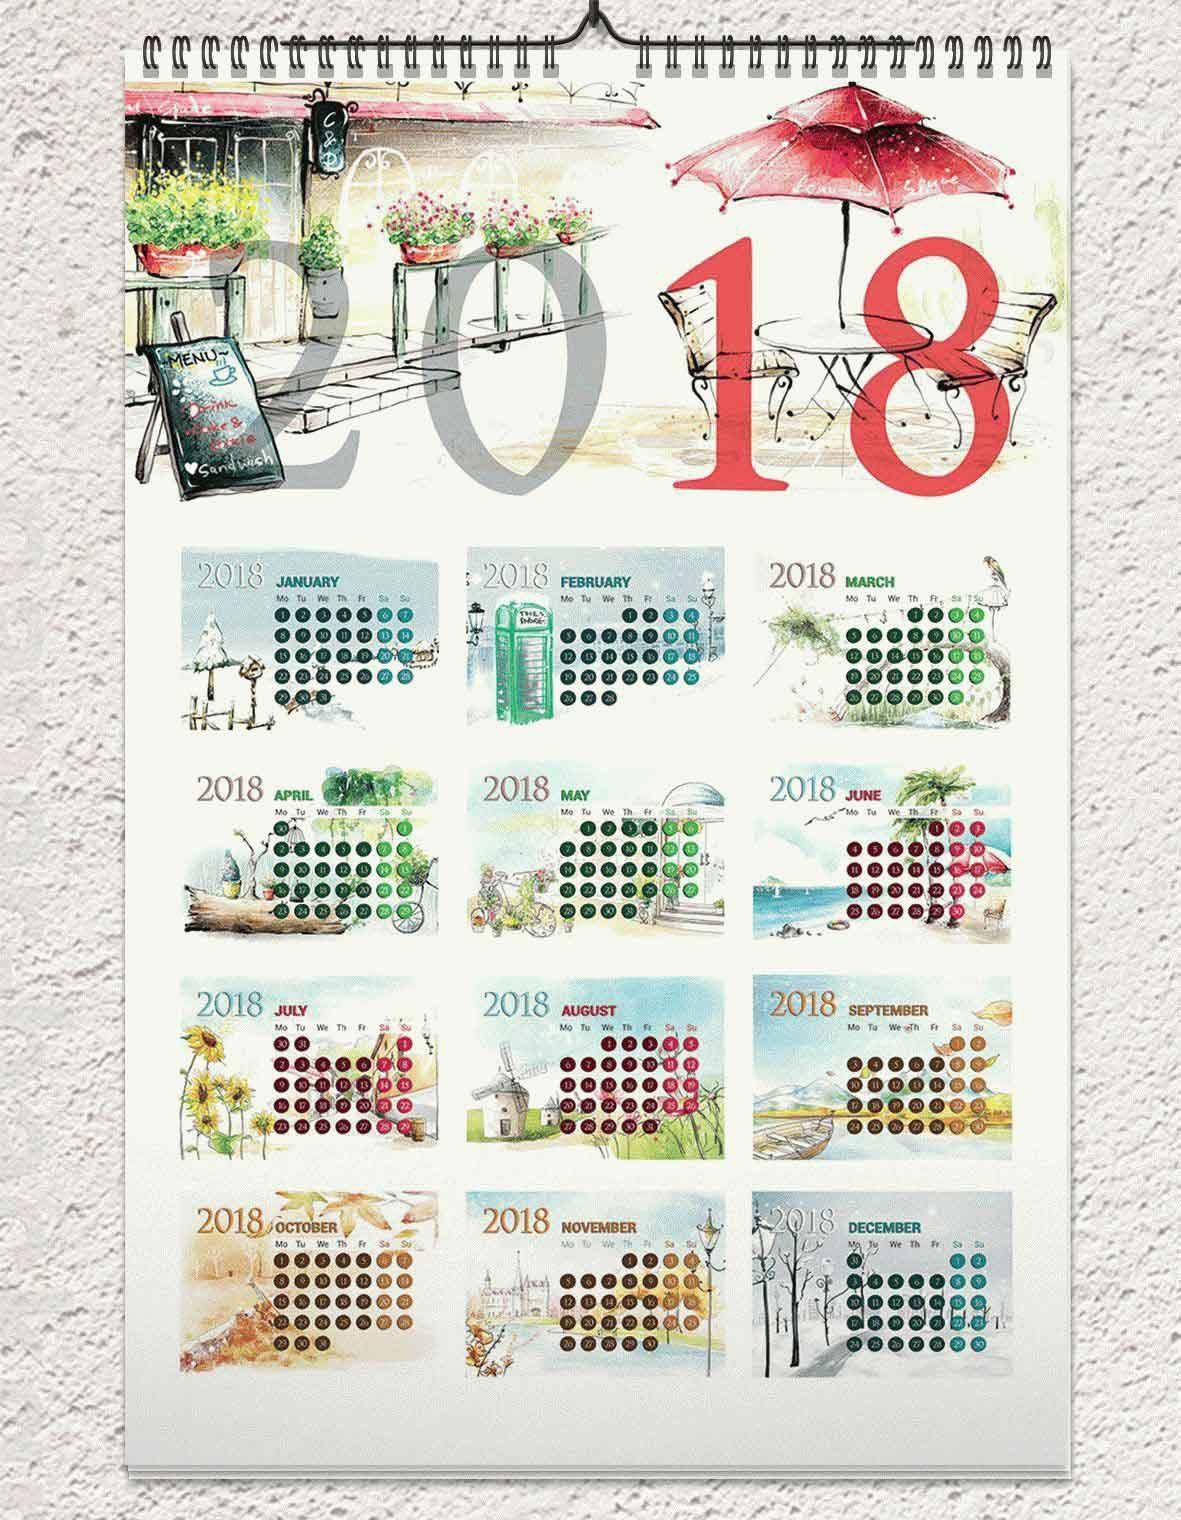 40+Premium And Free Psd Calendar Templates & Mockups To Create The Calendar 2019 Template Psd